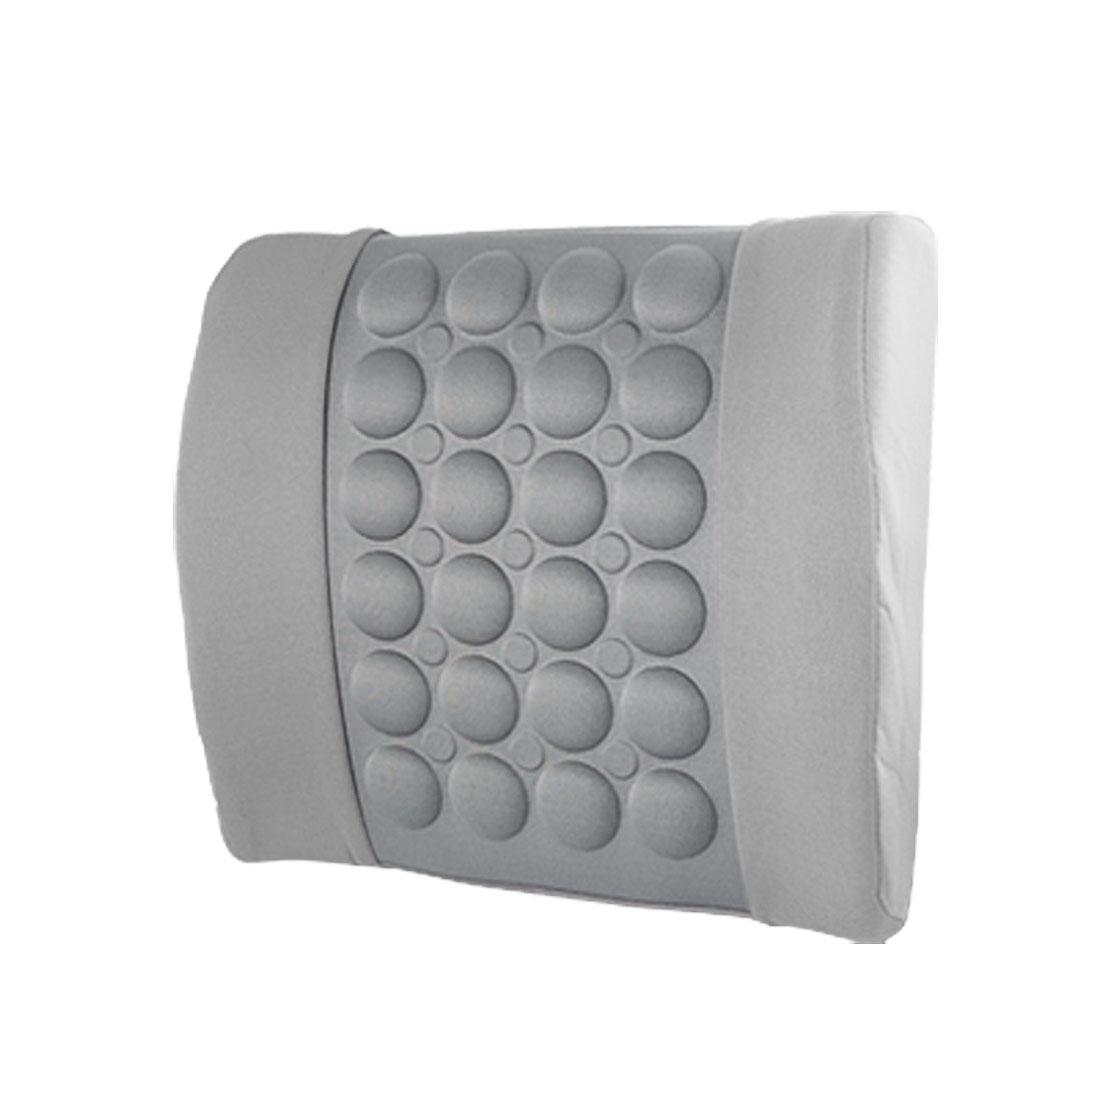 Auto Car Elastic Strap Gray Bubble Waist Cushion w Car Charger